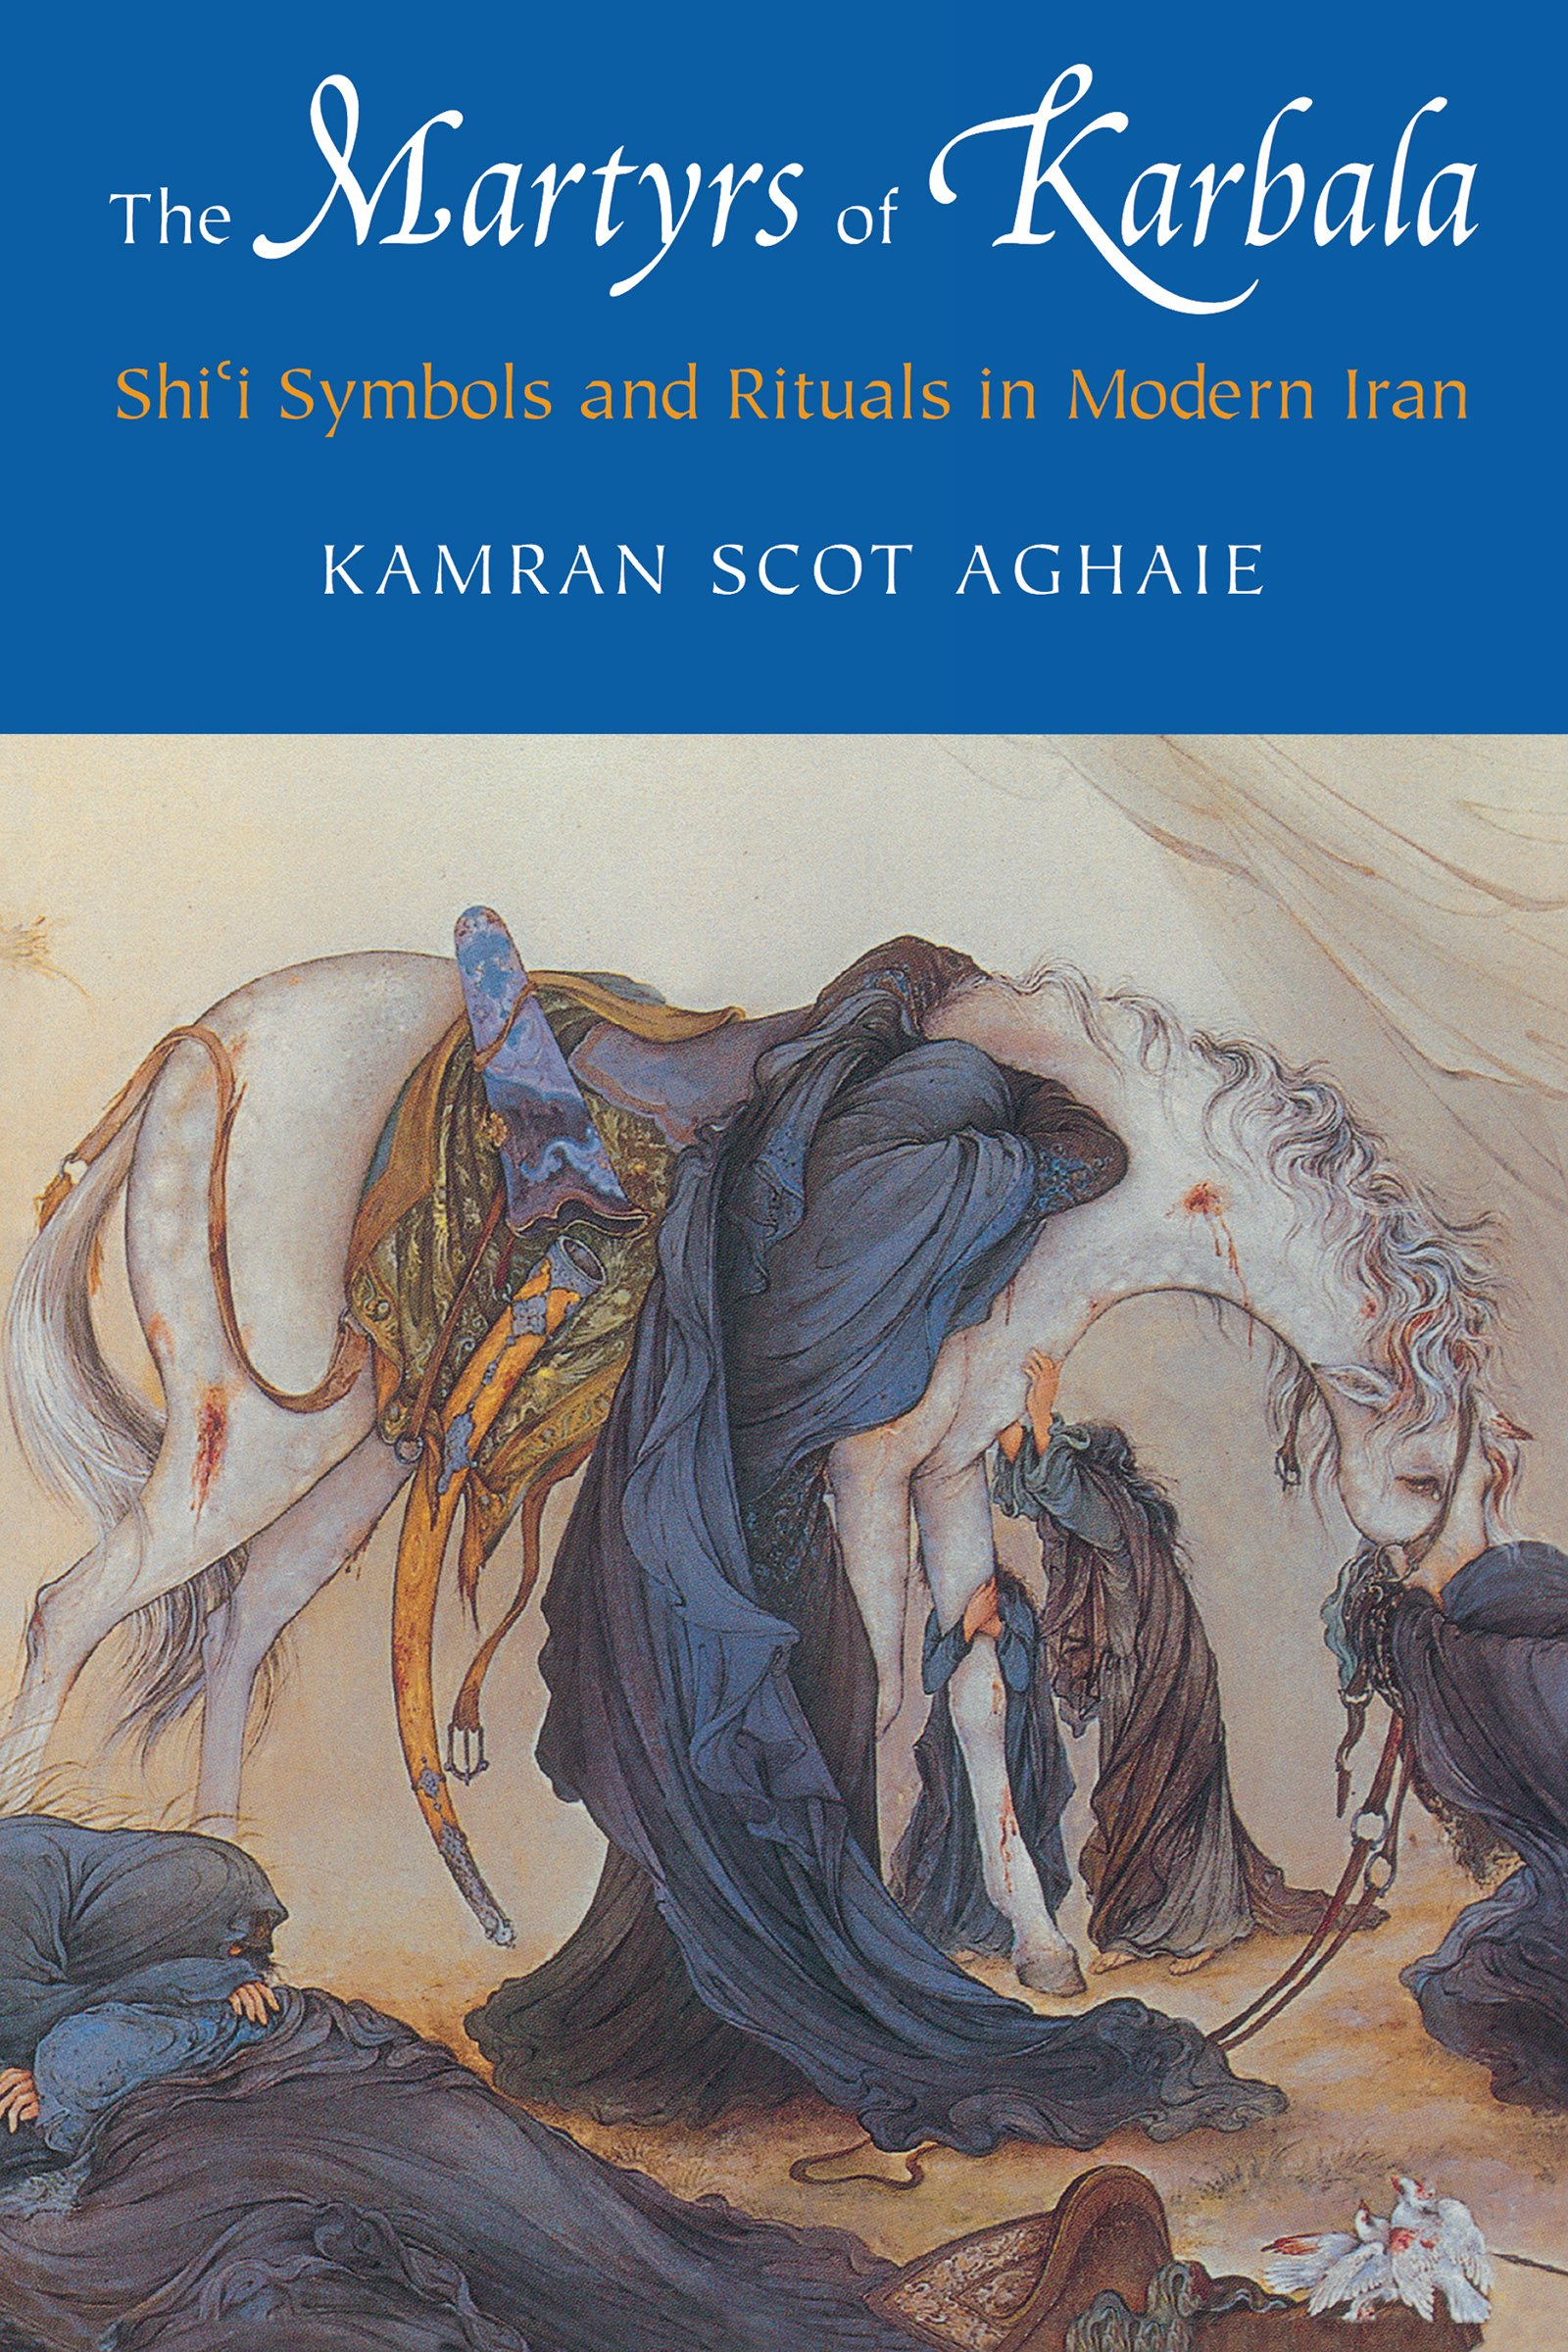 The Martyrs Of Karbala Shii Symbols And Rituals In Modern Iran